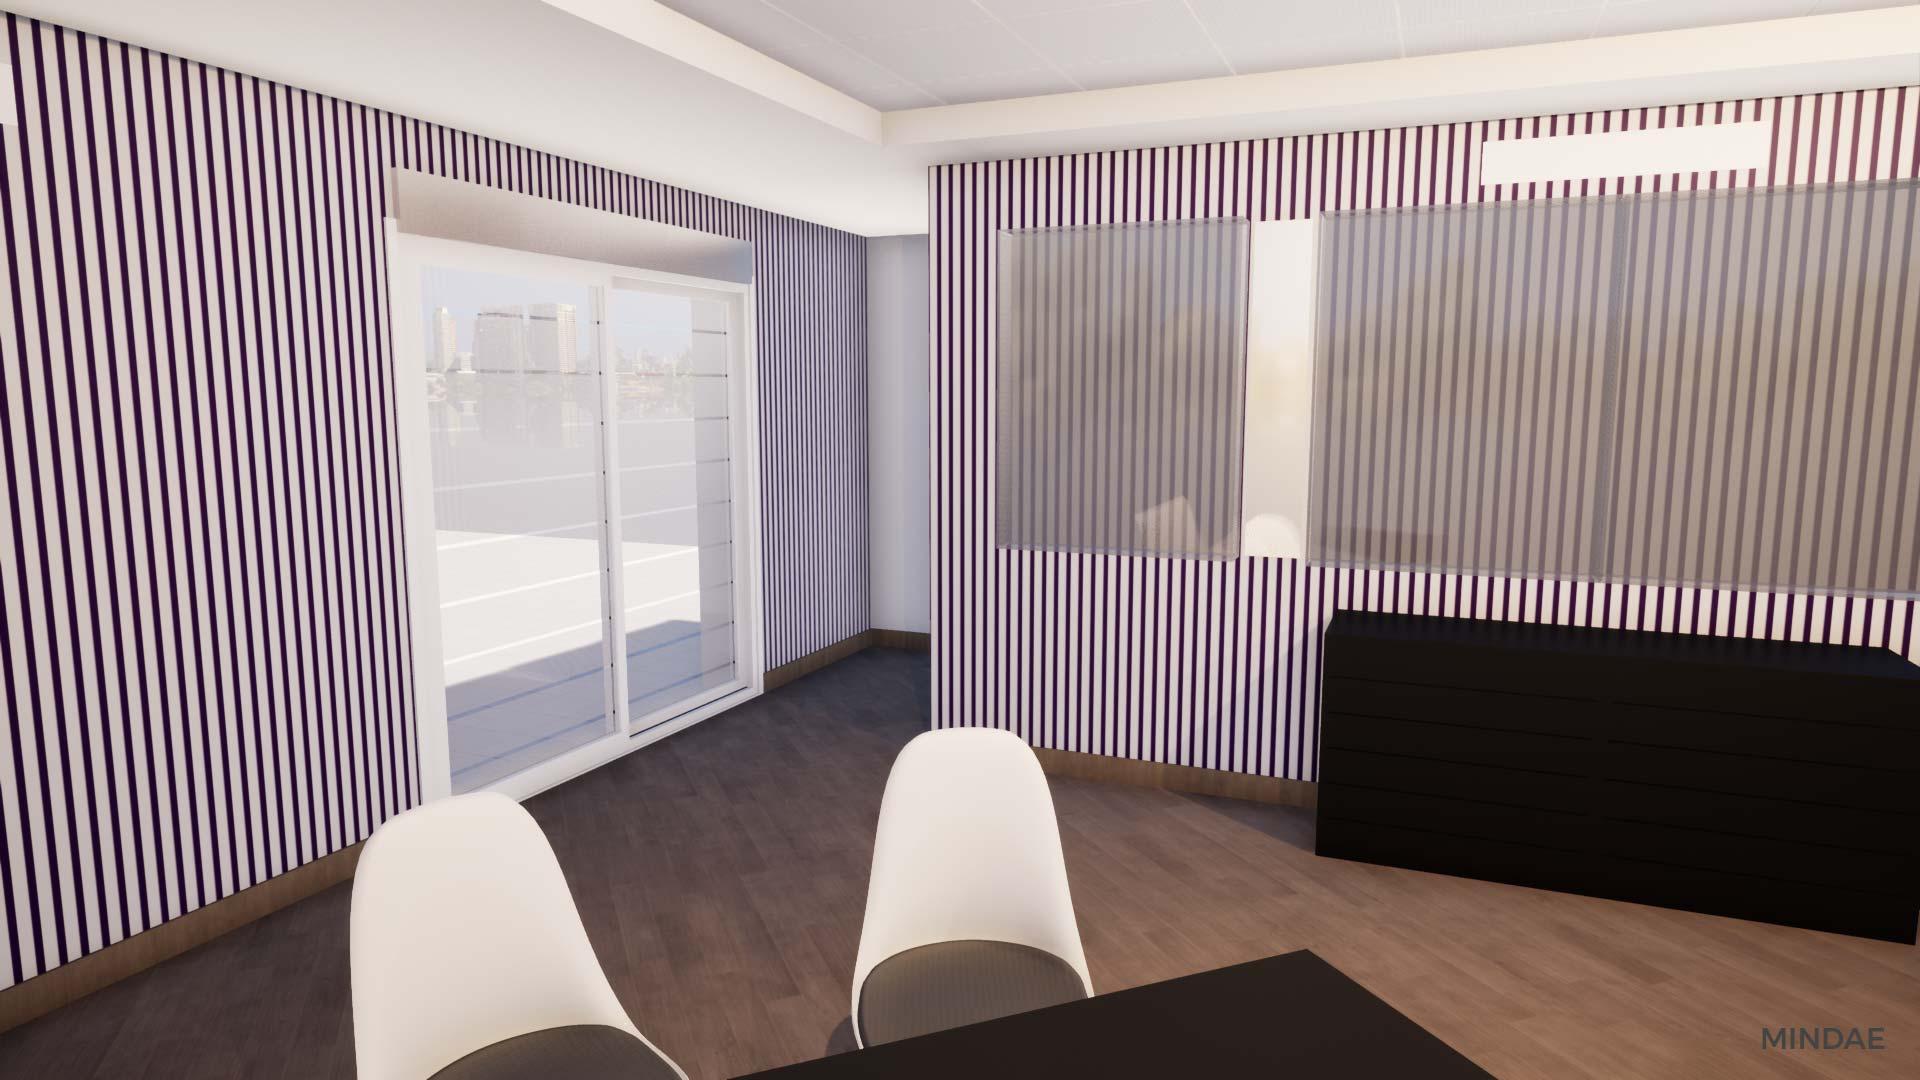 Mindae_3D_opticien_projet_caen_guynemer_design_rayures_lunettes-(4)